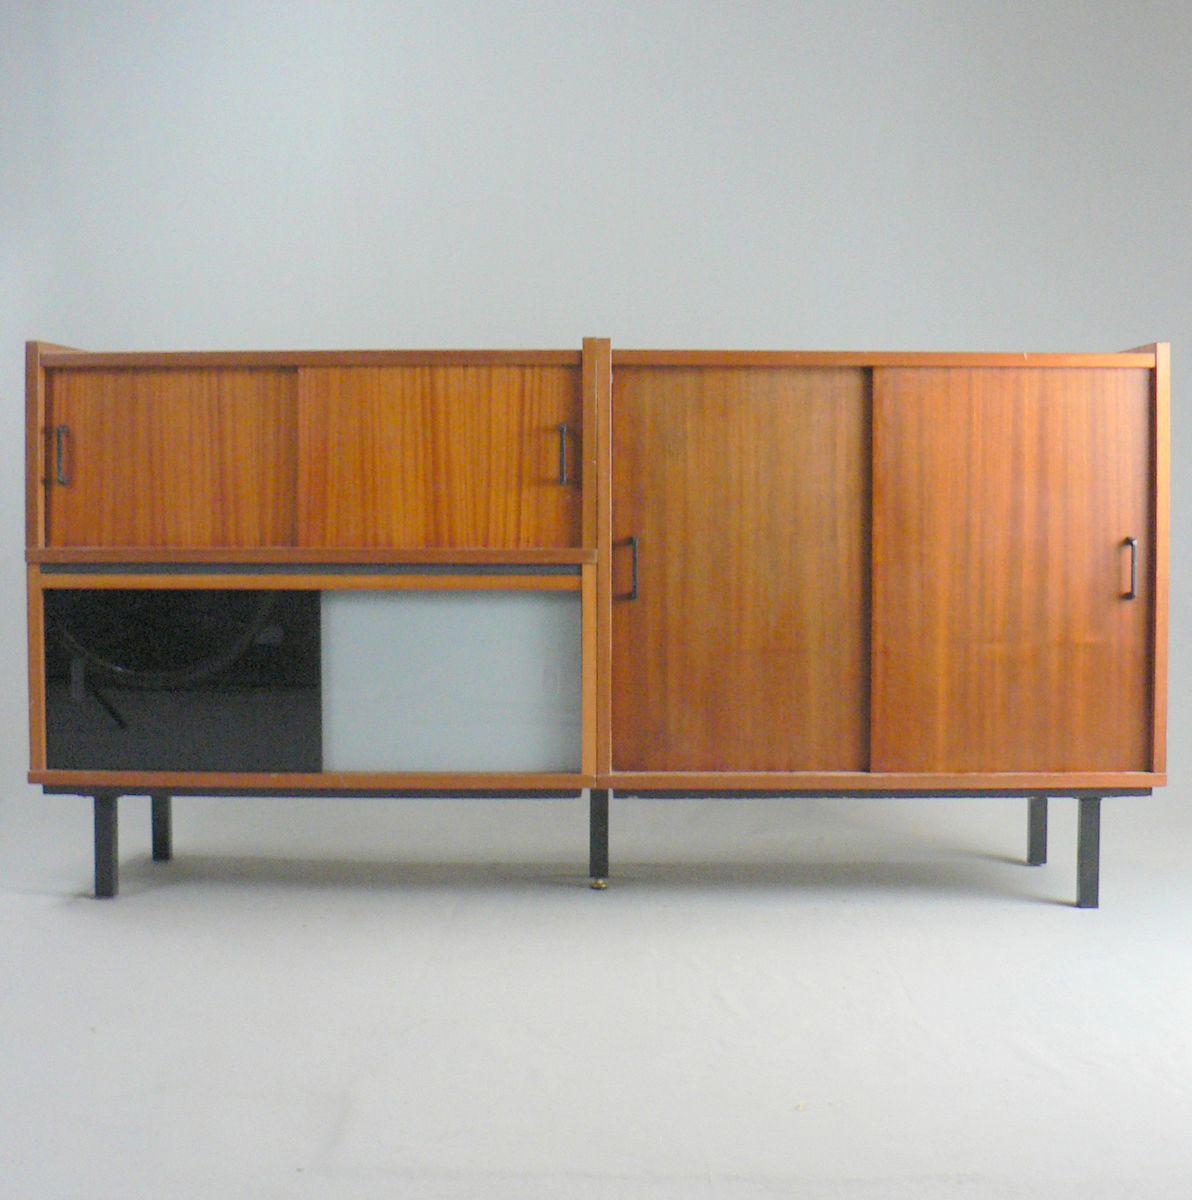 sideboard aus mahagoni furnier glas 1960er bei pamono kaufen. Black Bedroom Furniture Sets. Home Design Ideas